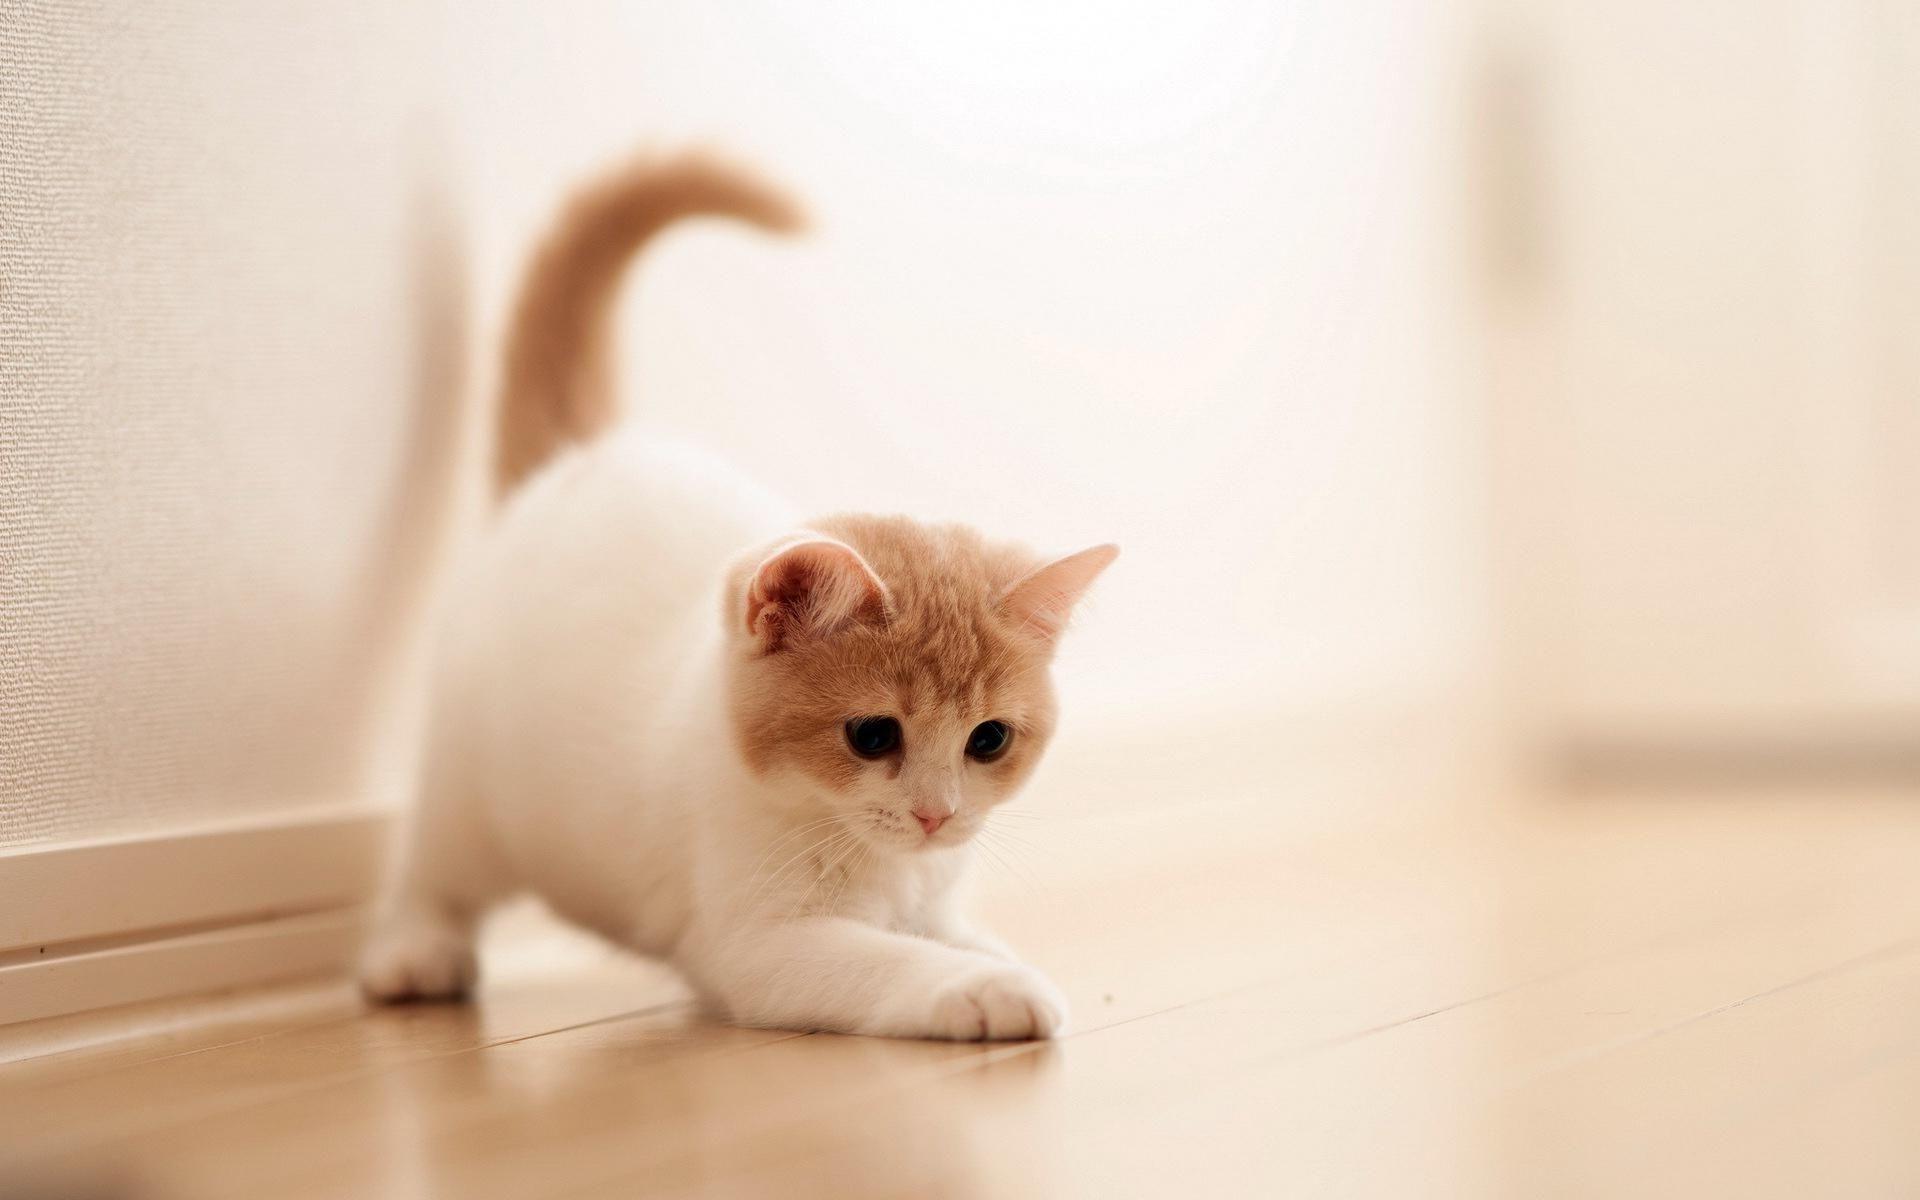 HD Free Cat Wallpapers HD Images New × Cat Hd Wallpaper